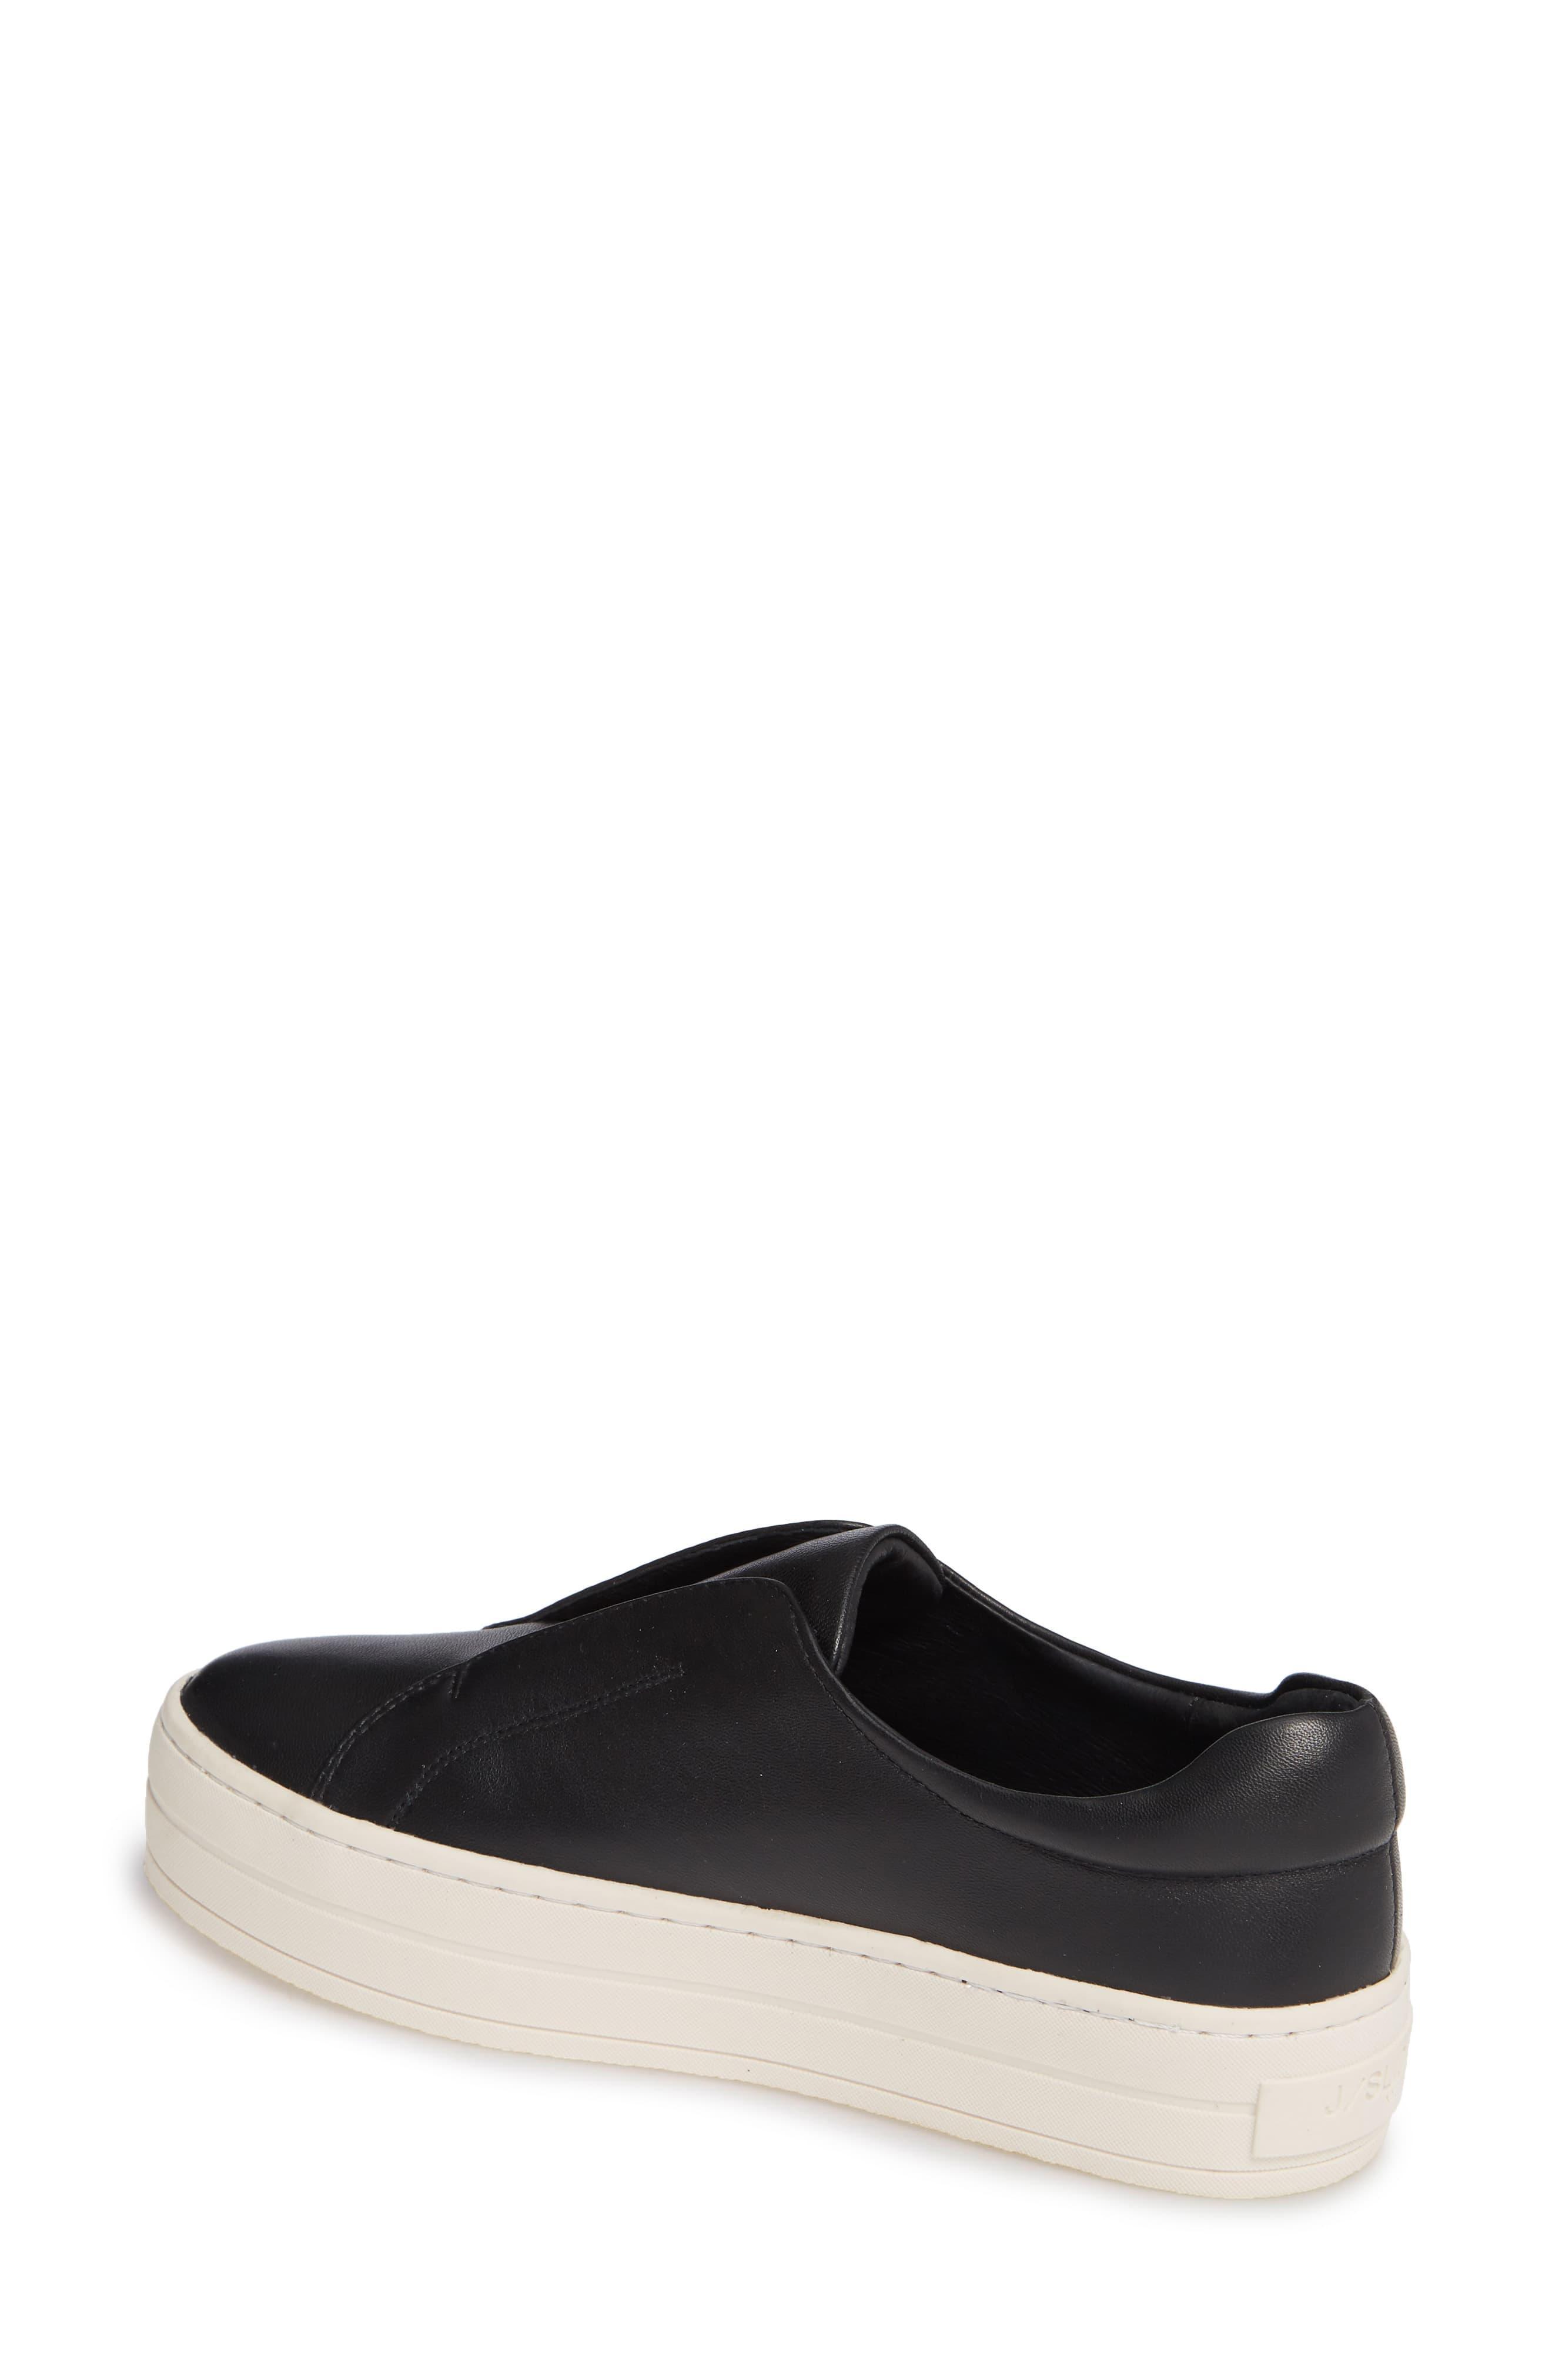 b75b852a4d3a0 J/Slides Heidi Platform Slip-on Sneaker in Black - Save 2% - Lyst